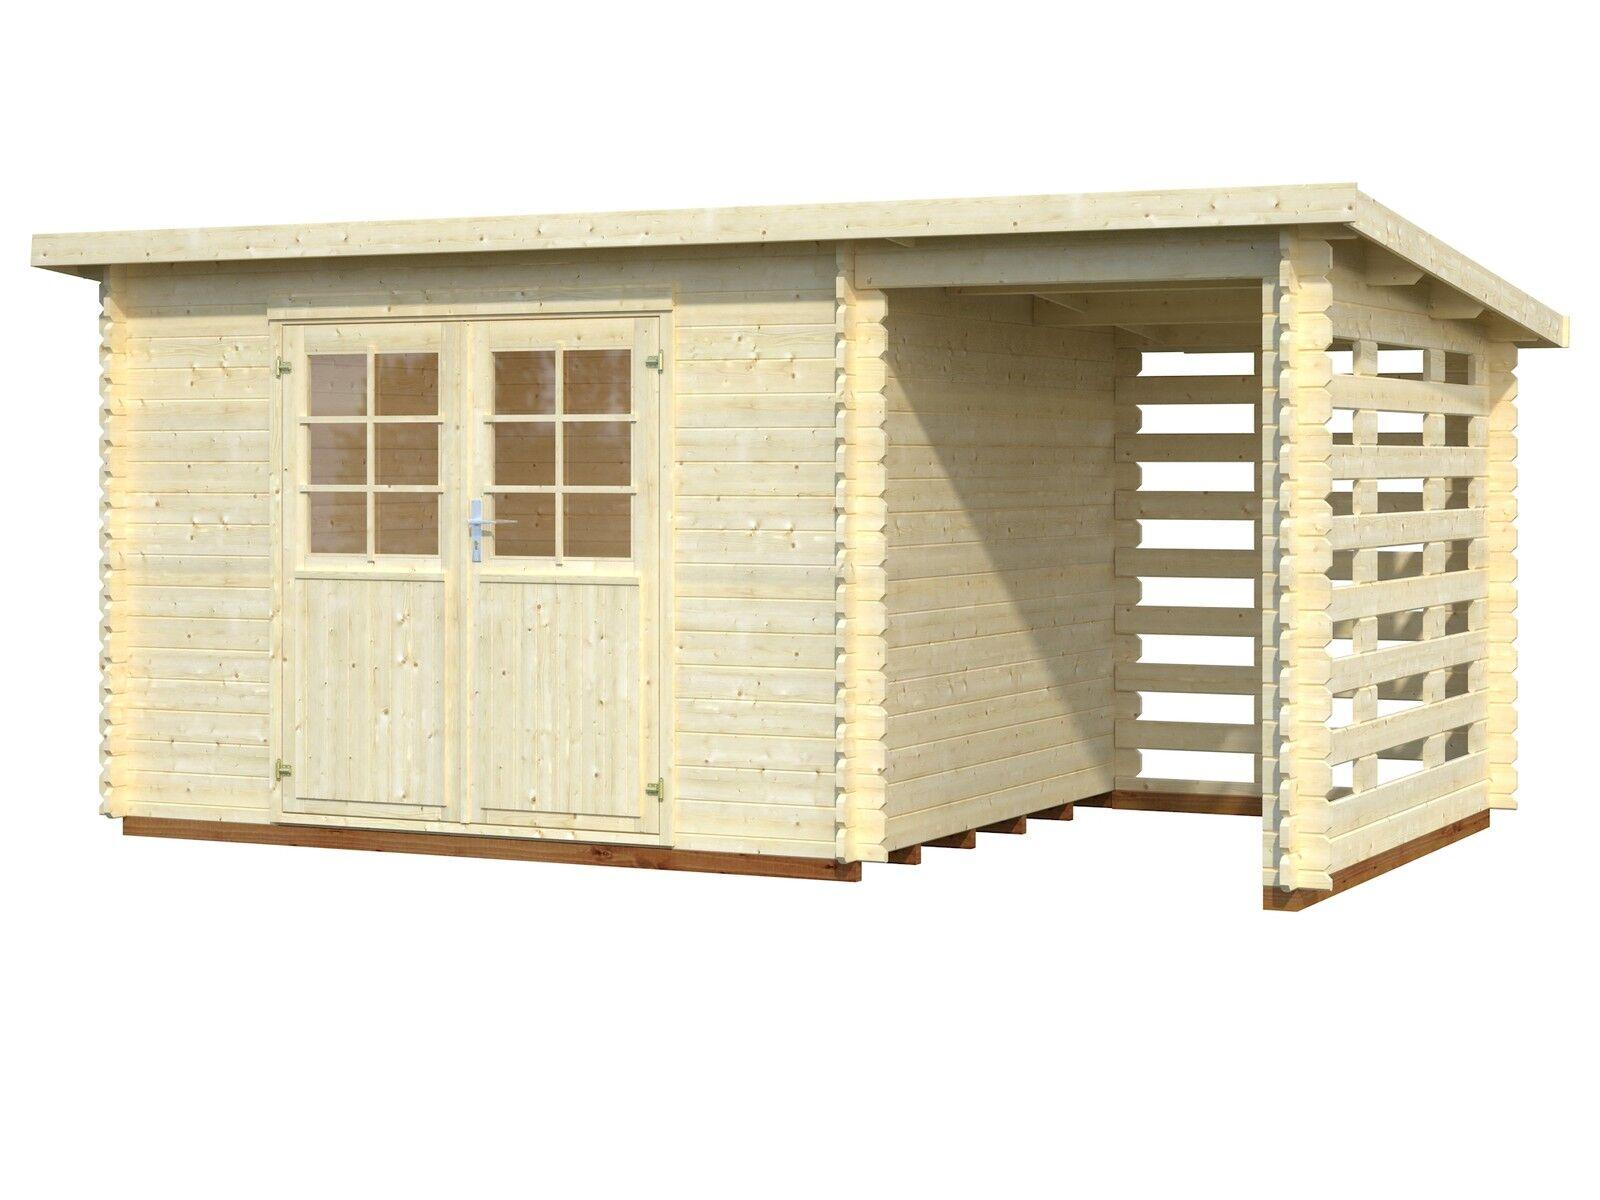 28 mm gartenhaus 490x300 anbau ger tehaus pultdach schuppen schleppdach holzhaus eur. Black Bedroom Furniture Sets. Home Design Ideas